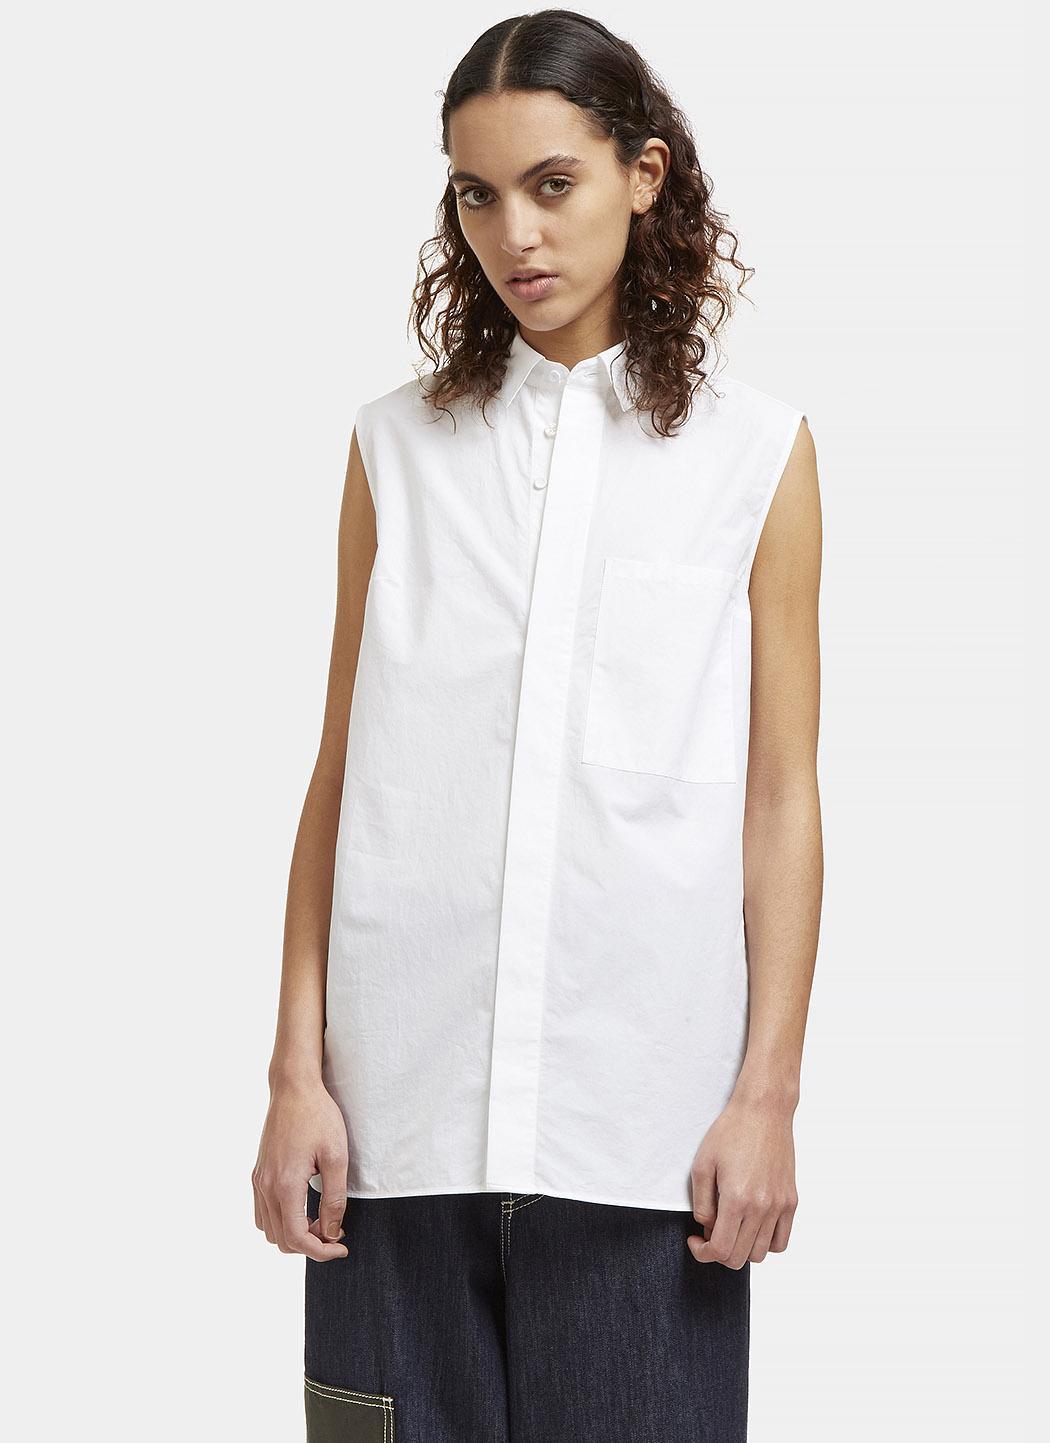 Acne Women 39 S Belevue Sleeveless Shirt In White In White Lyst